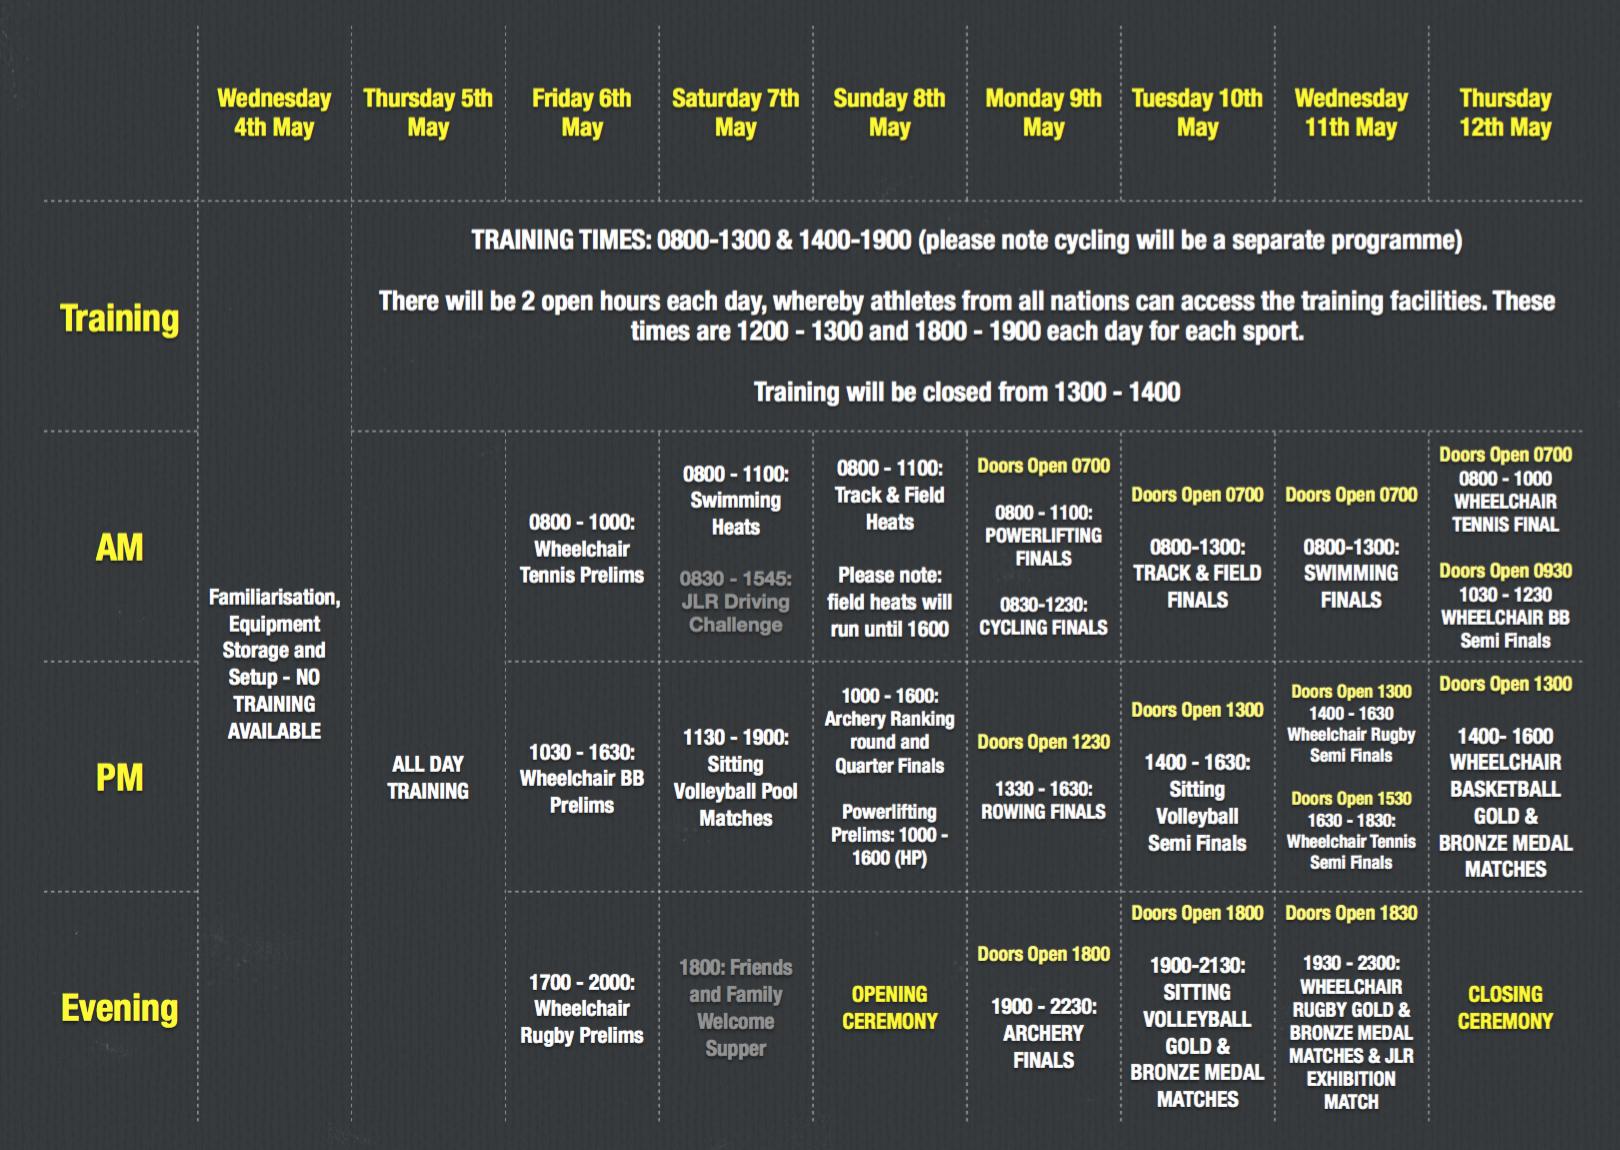 Invictus Games 2016 Schedule of Events